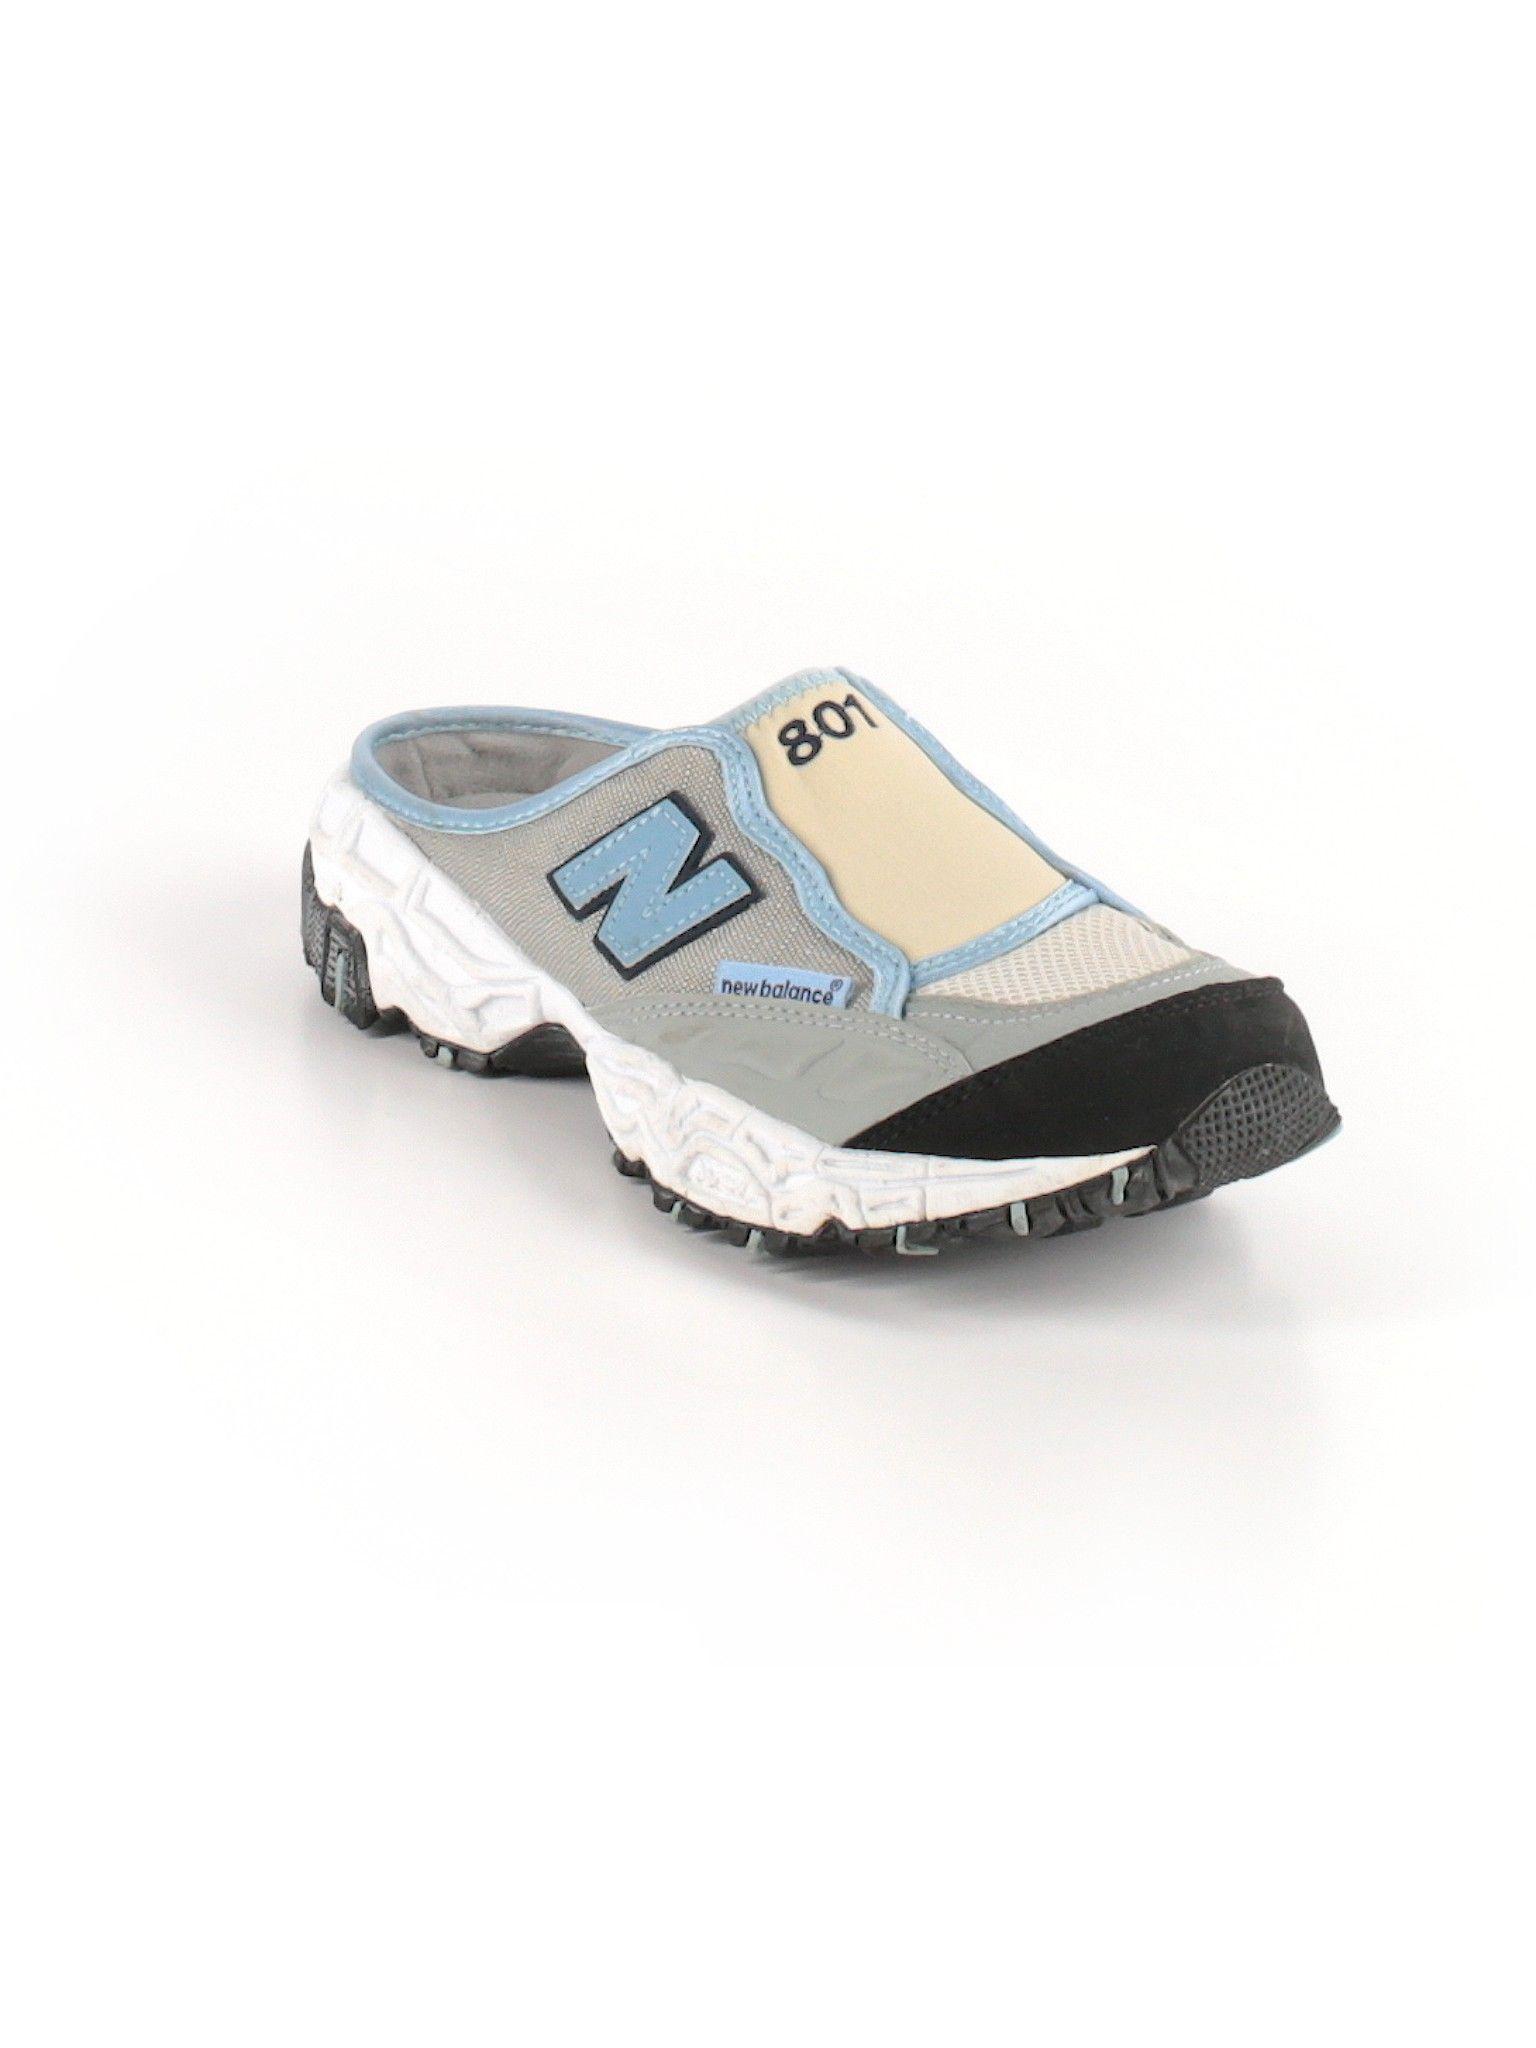 8f1cb648b187a New Balance Mule/Clog: Size 9.00 Gray Women's Clothing - $45.99